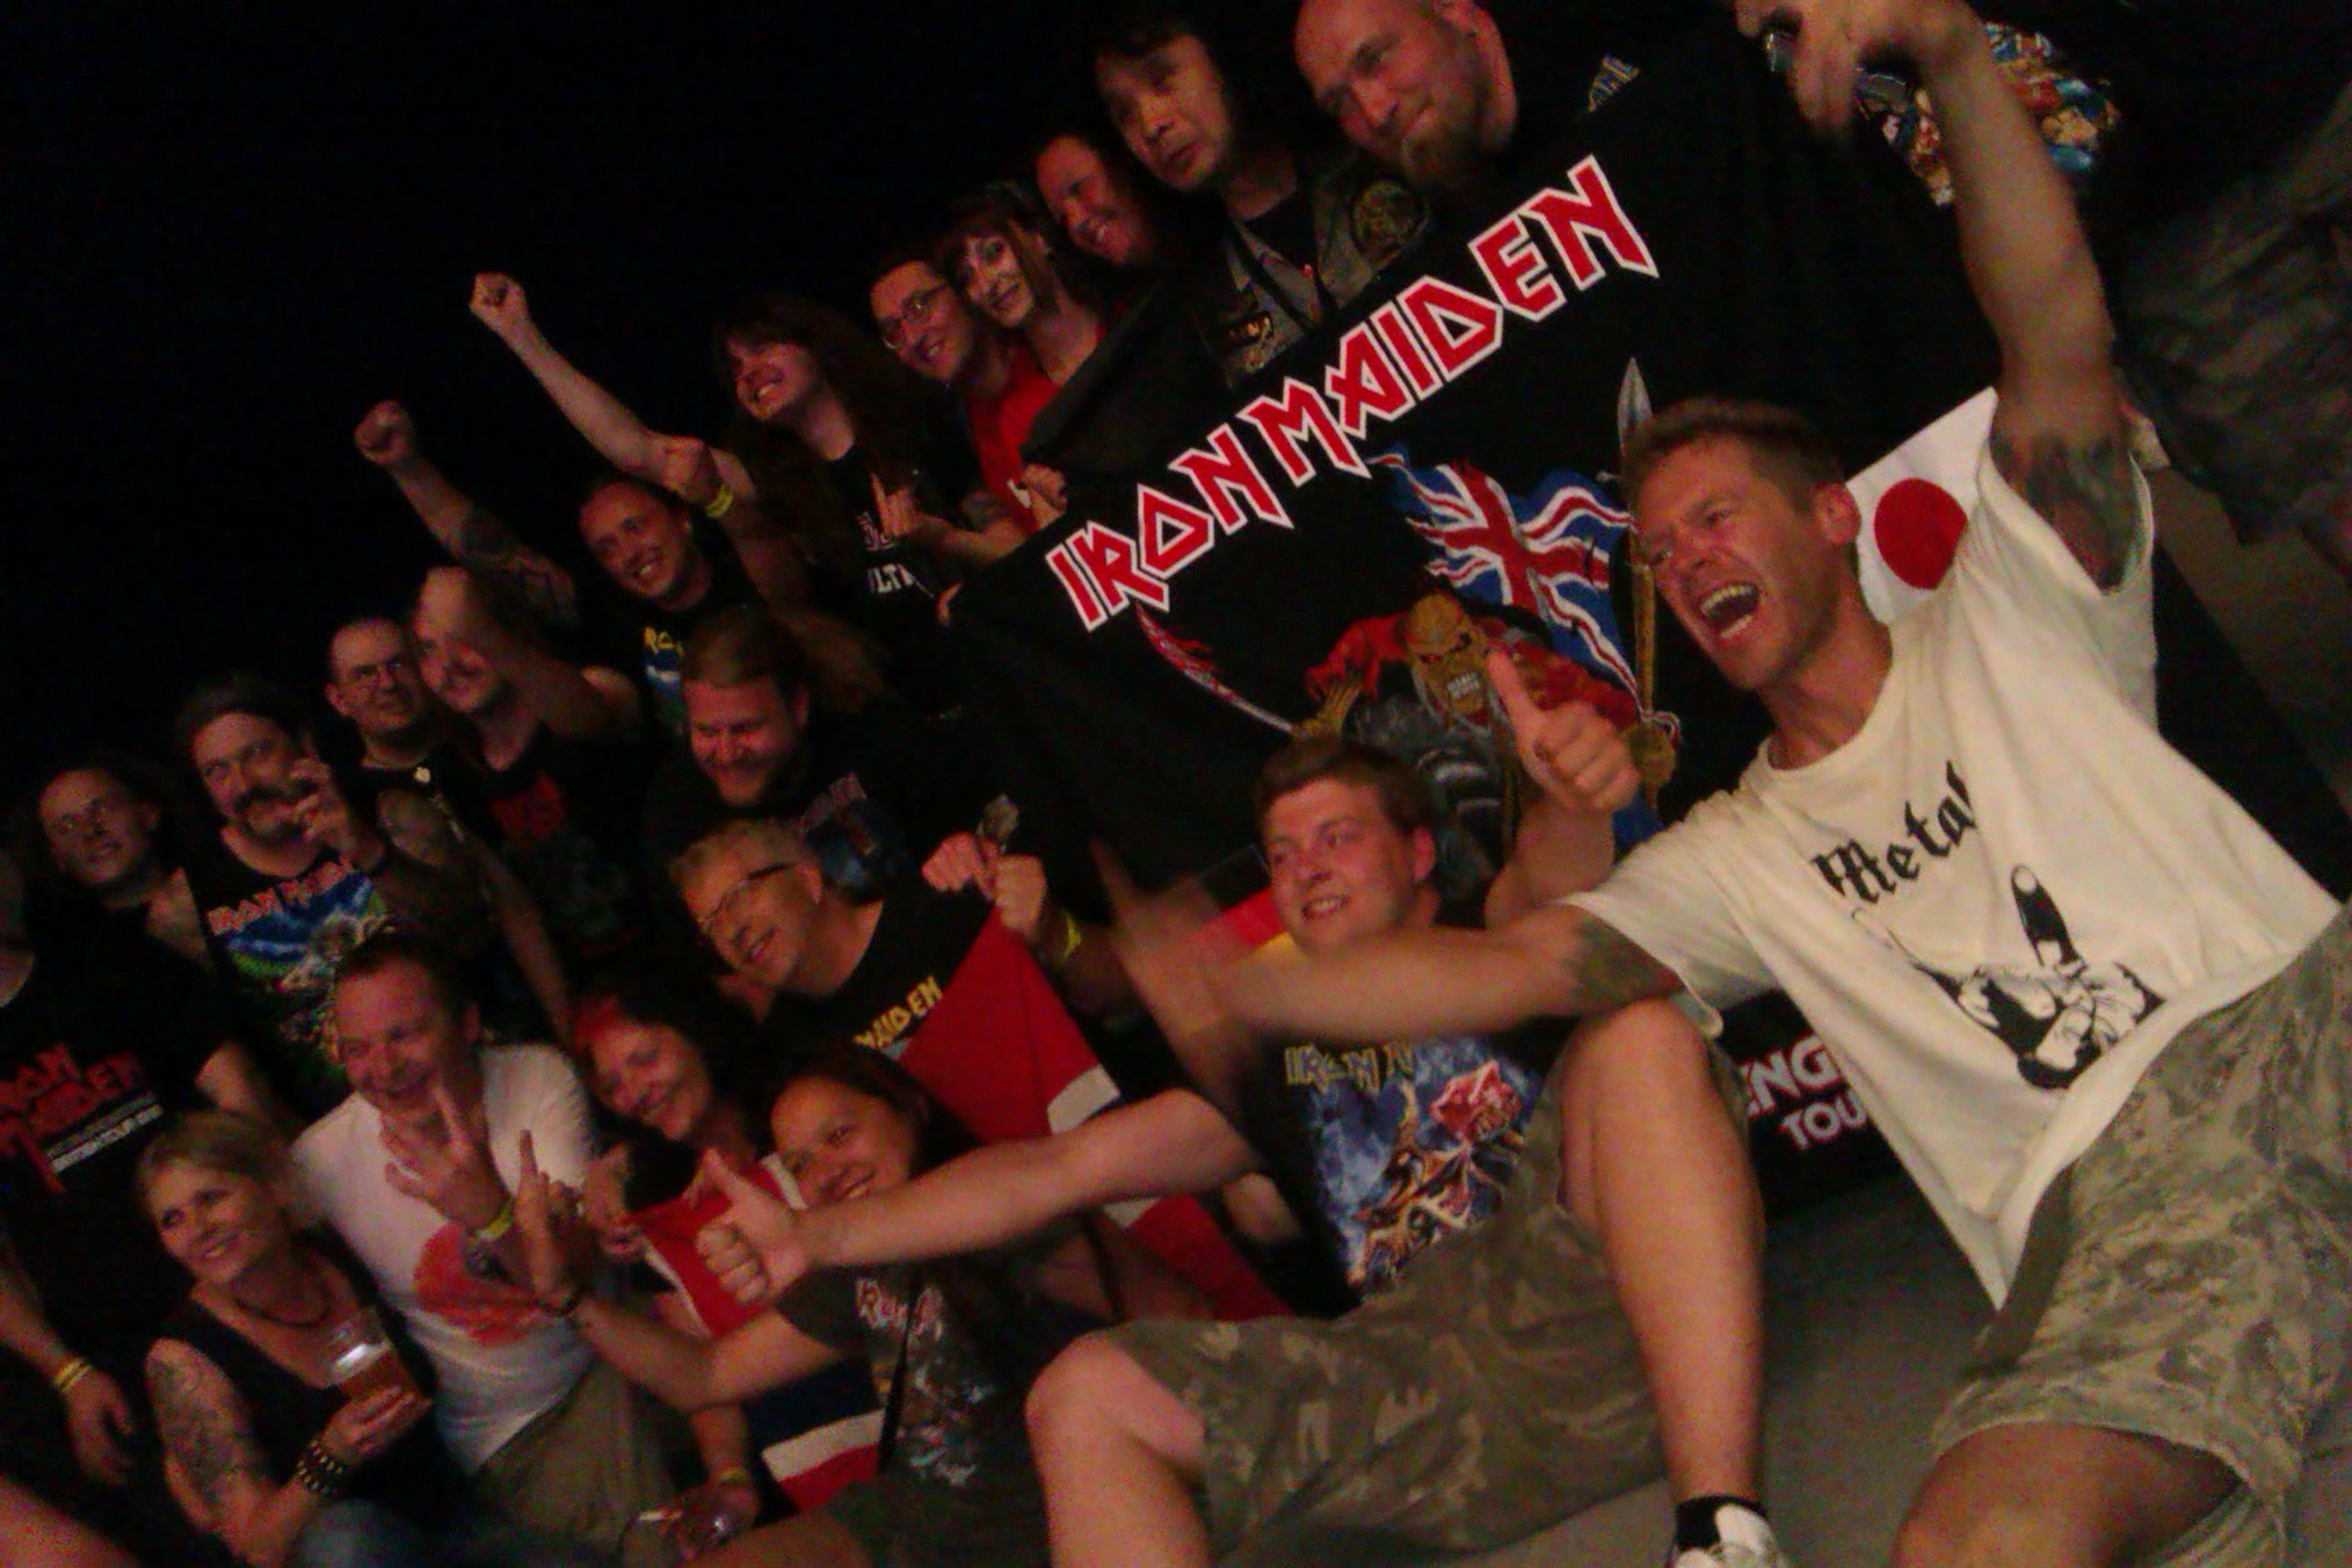 Iron Maiden-Fans in Berlin, 18.06.2013